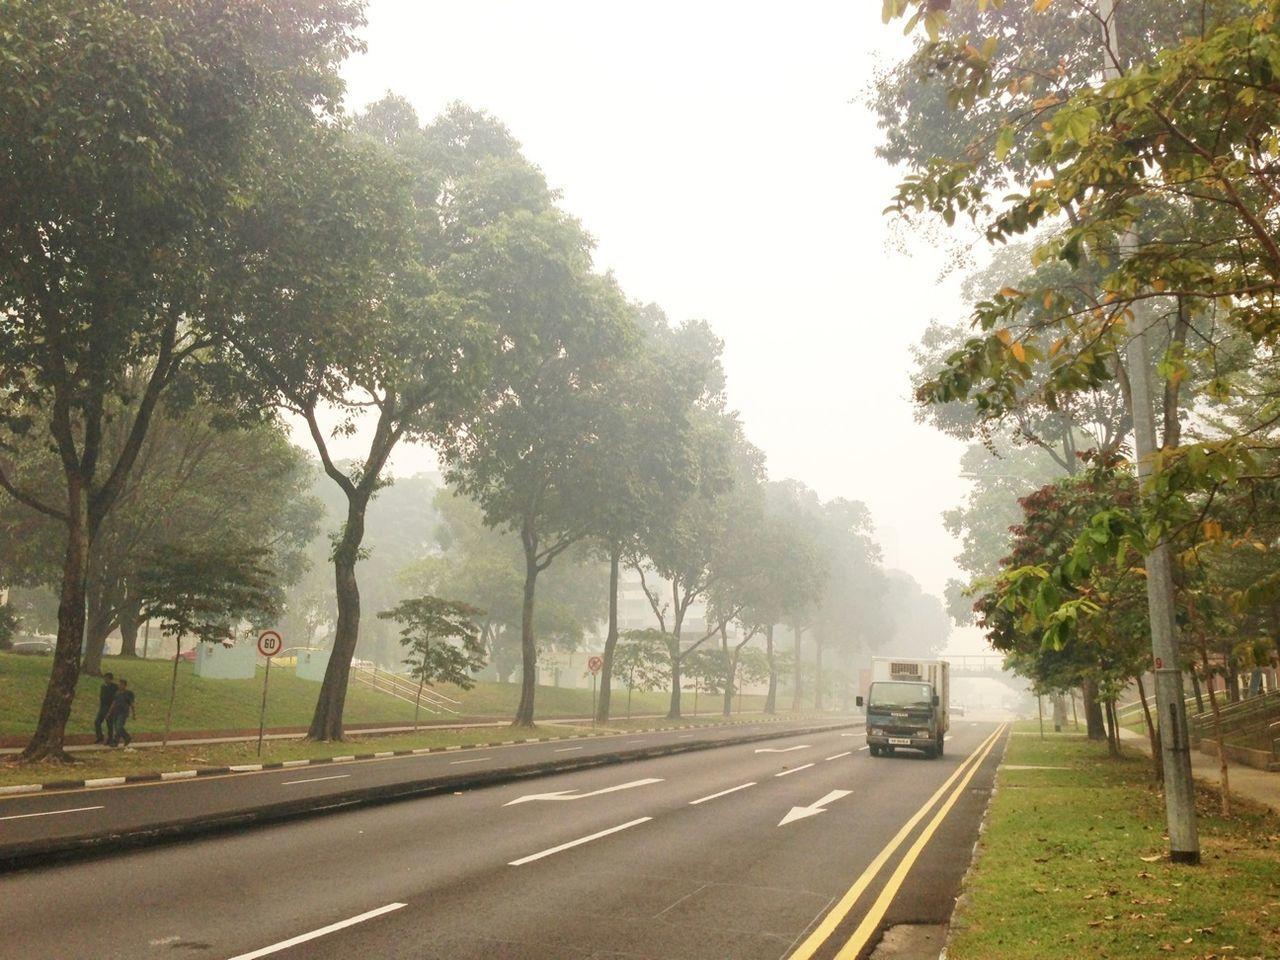 Hazy Singapore Street Life Streetphotography Haze Air Polution Street Lorry Road Visibility